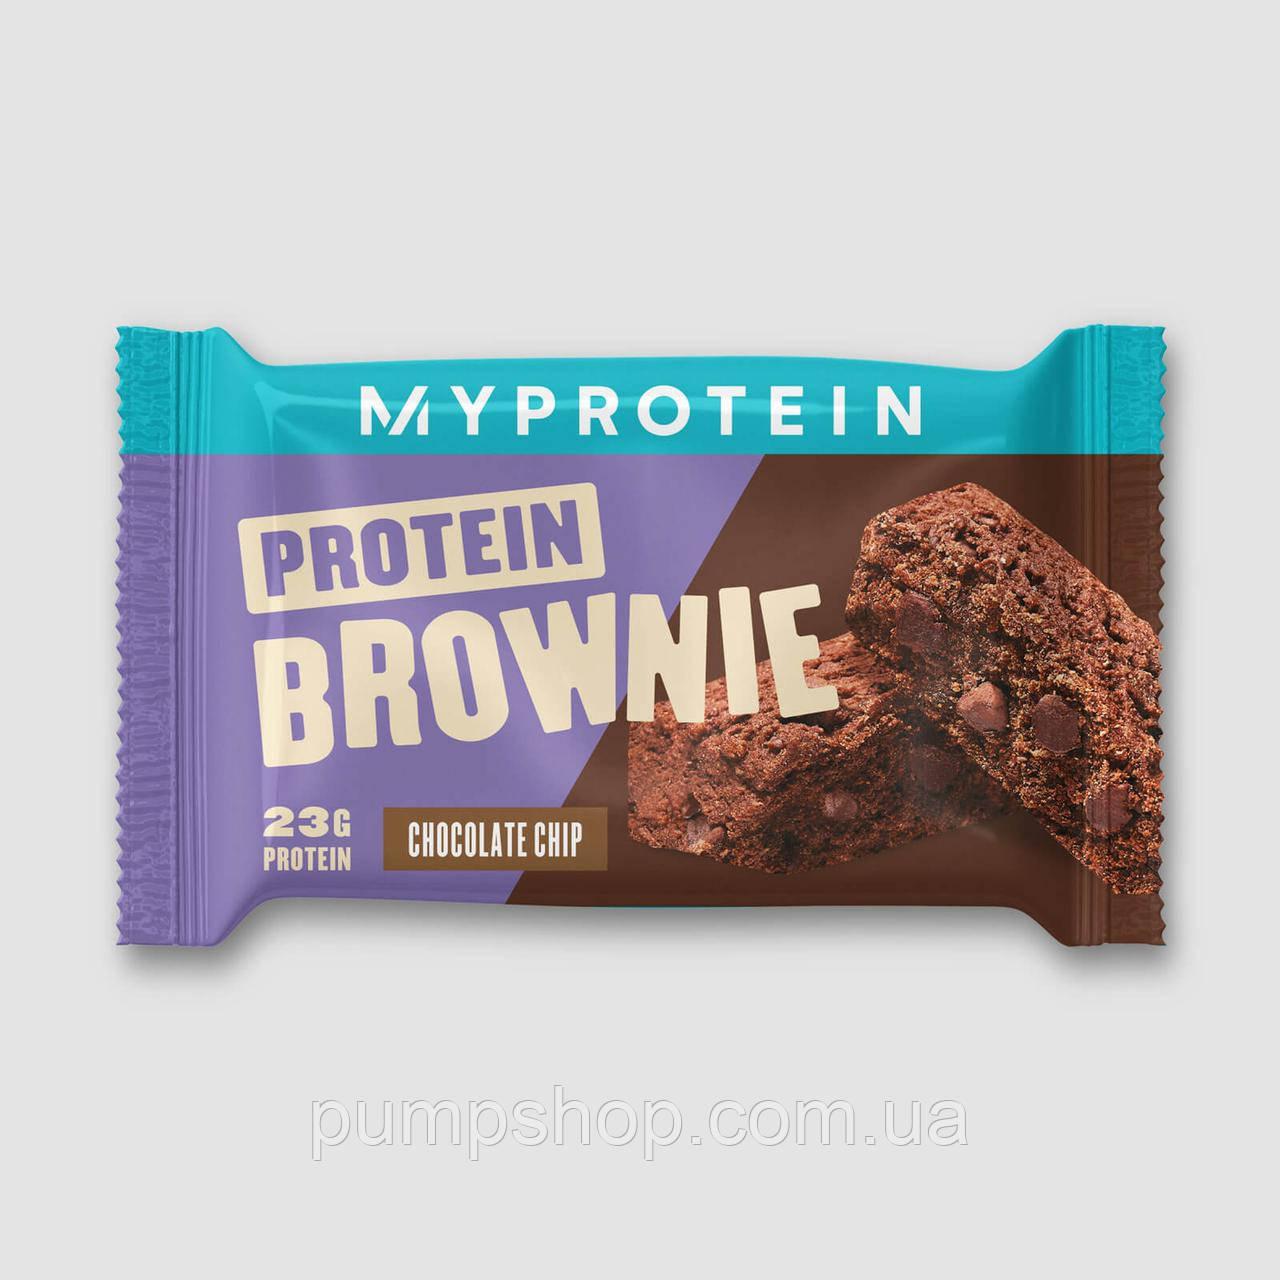 Протеїновий брауні Myprotein Protein Brownie 1 шт. 75 г